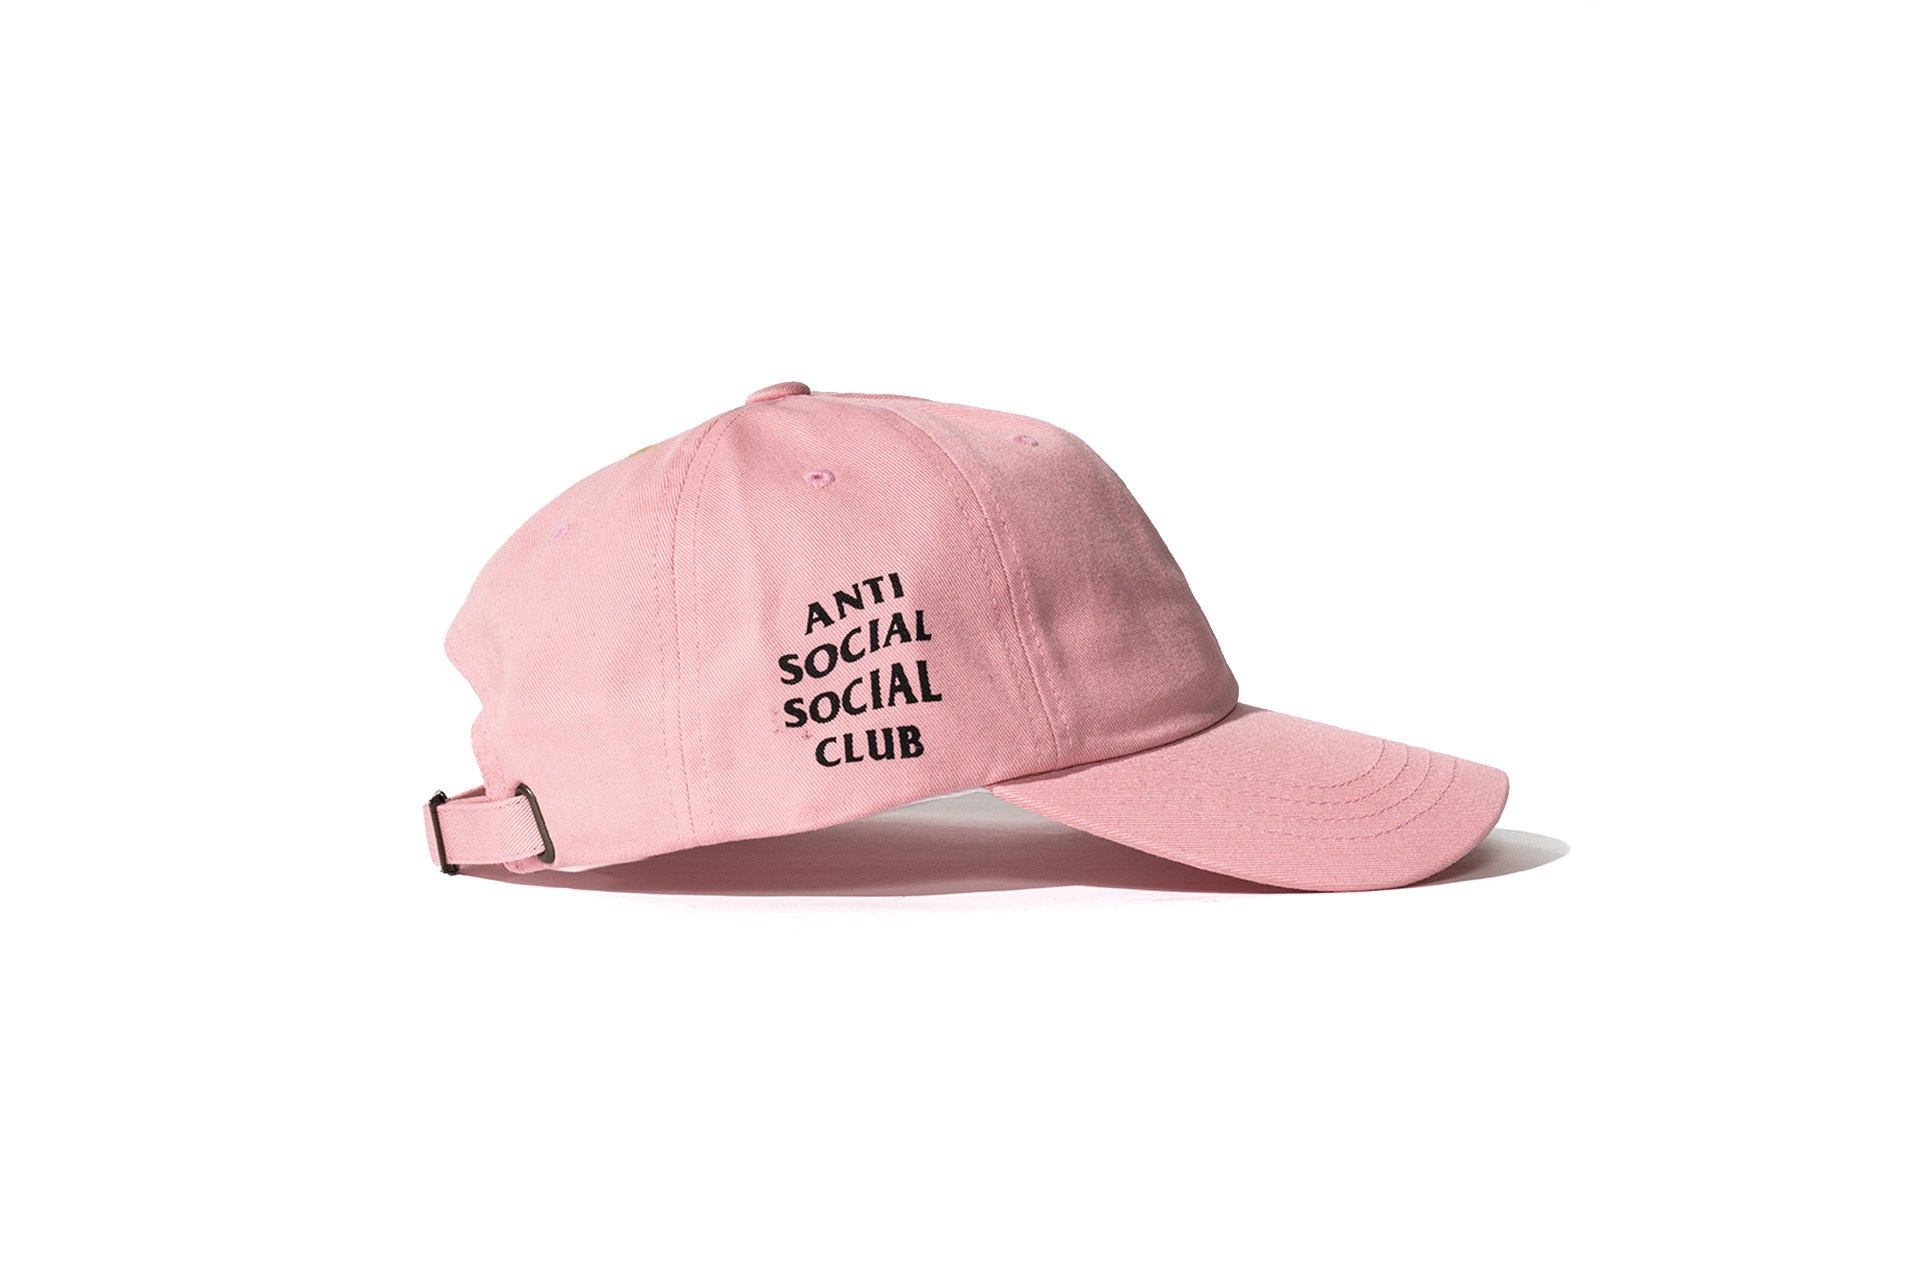 anti-social-social-club-collection-2017-spring-summer-63